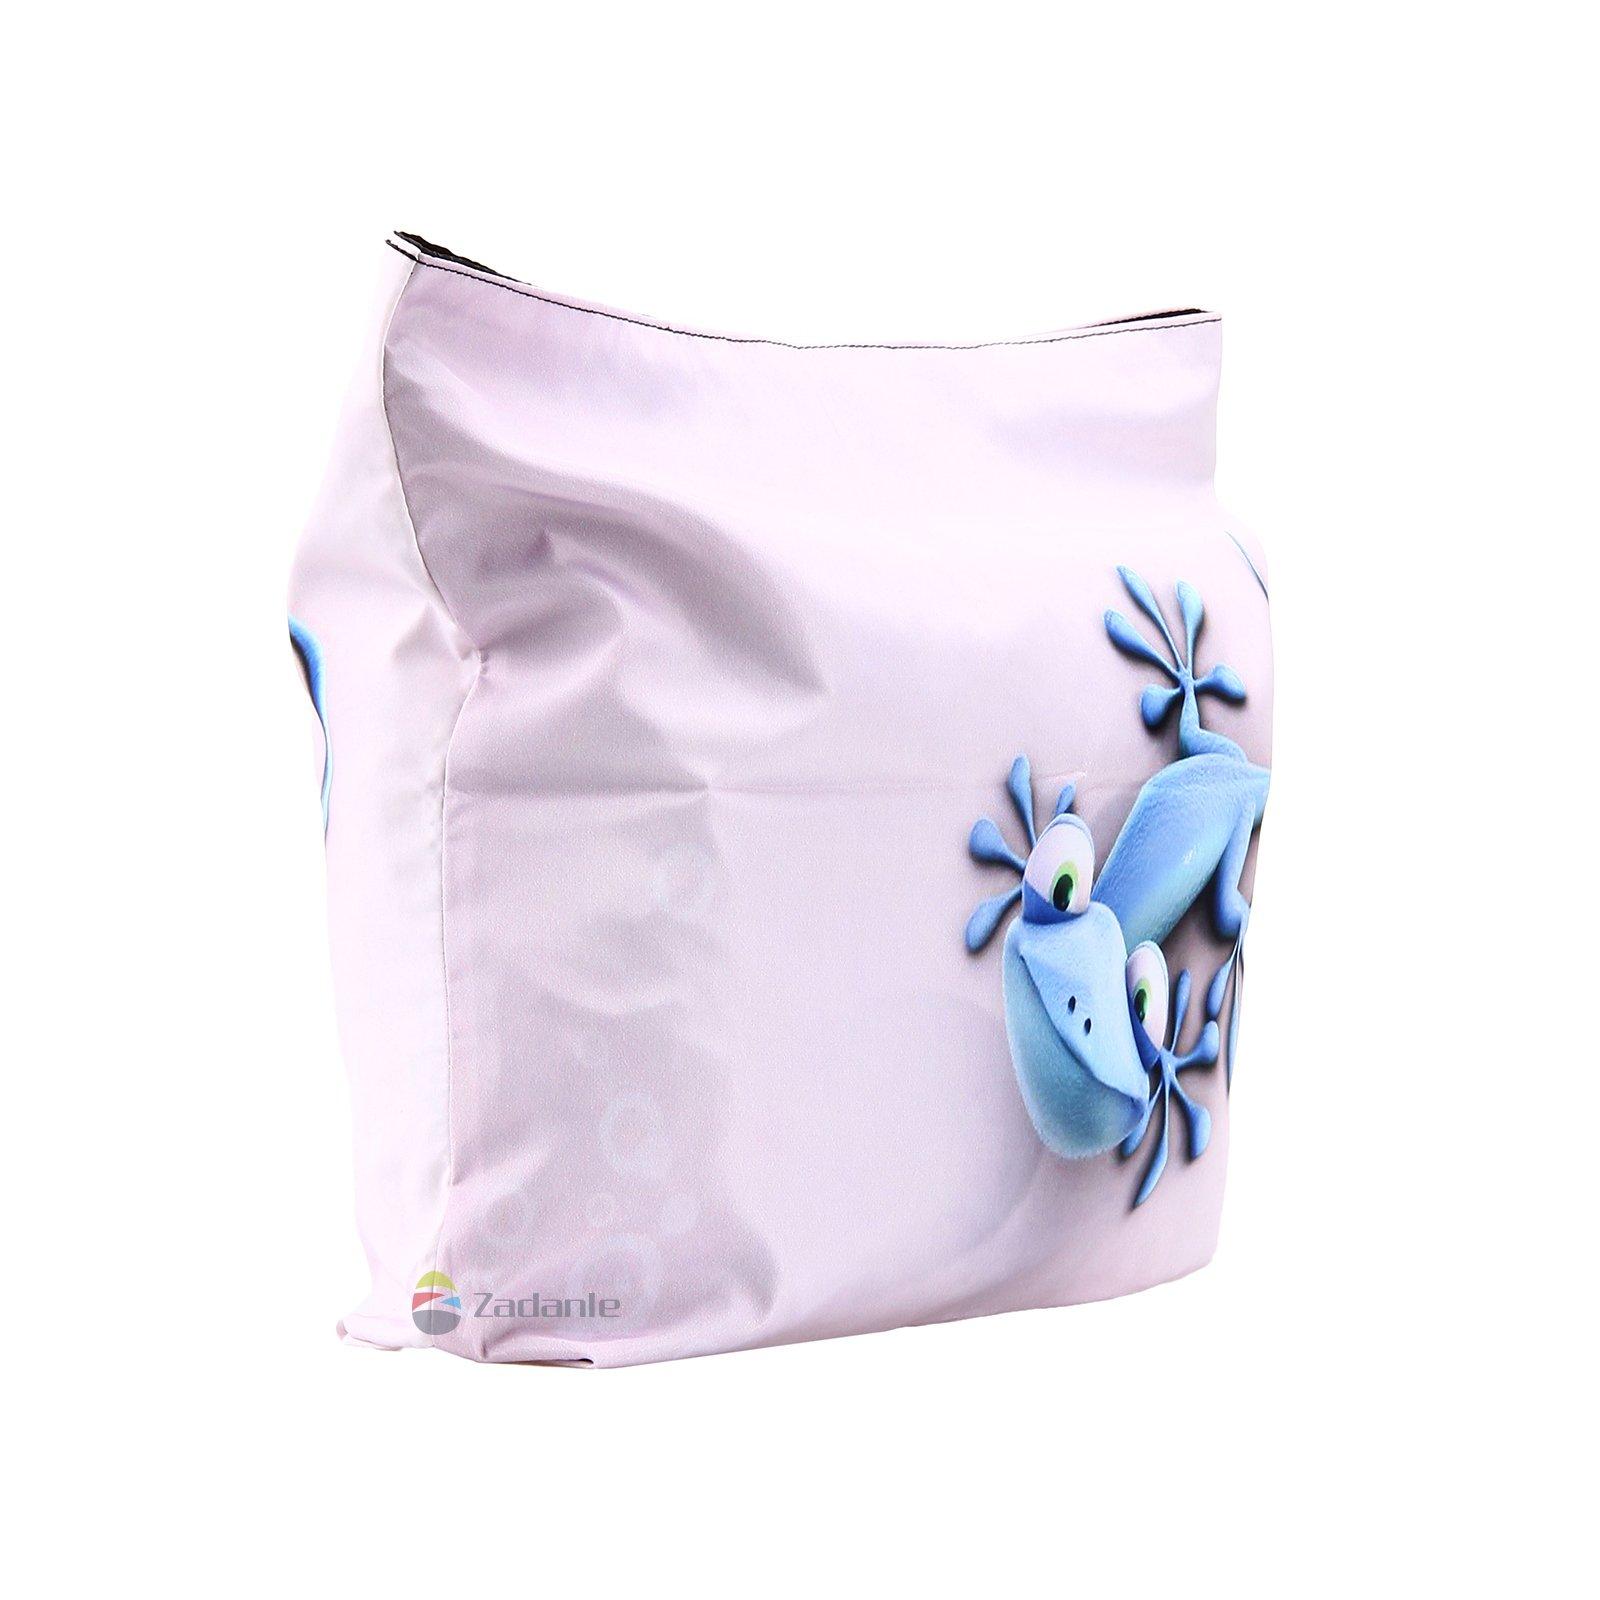 Newplenty Ladies Zippered Light Shoulder Shopping Tote Bag Handbag Beach Satchel (SB-6006) by newplenty (Image #4)